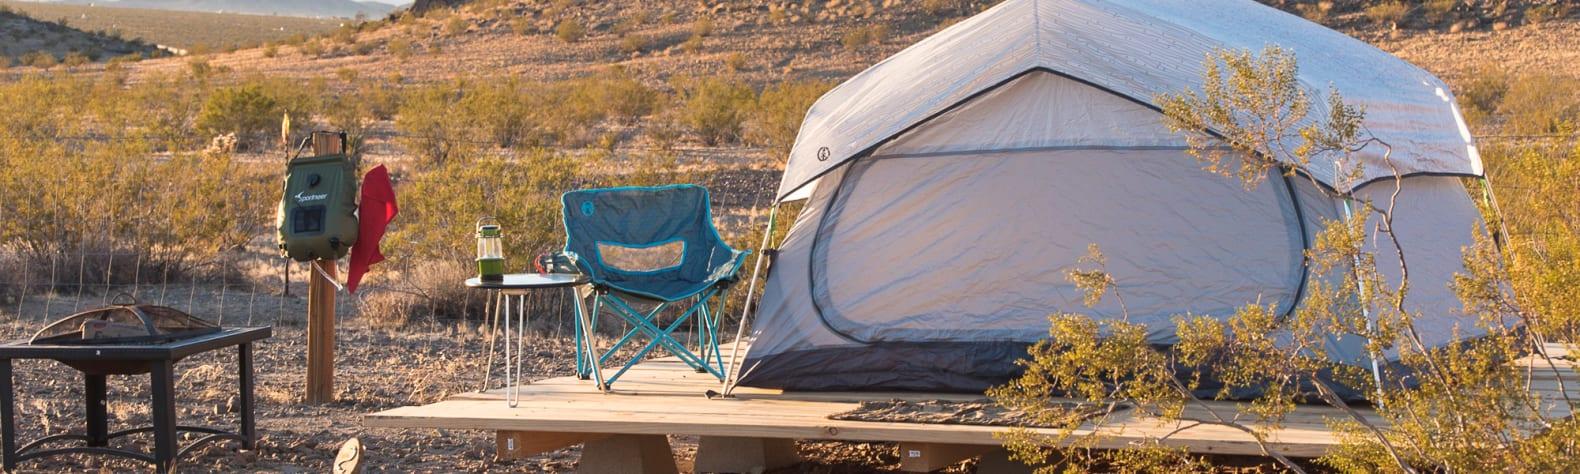 Desert Daisy- camp under stars